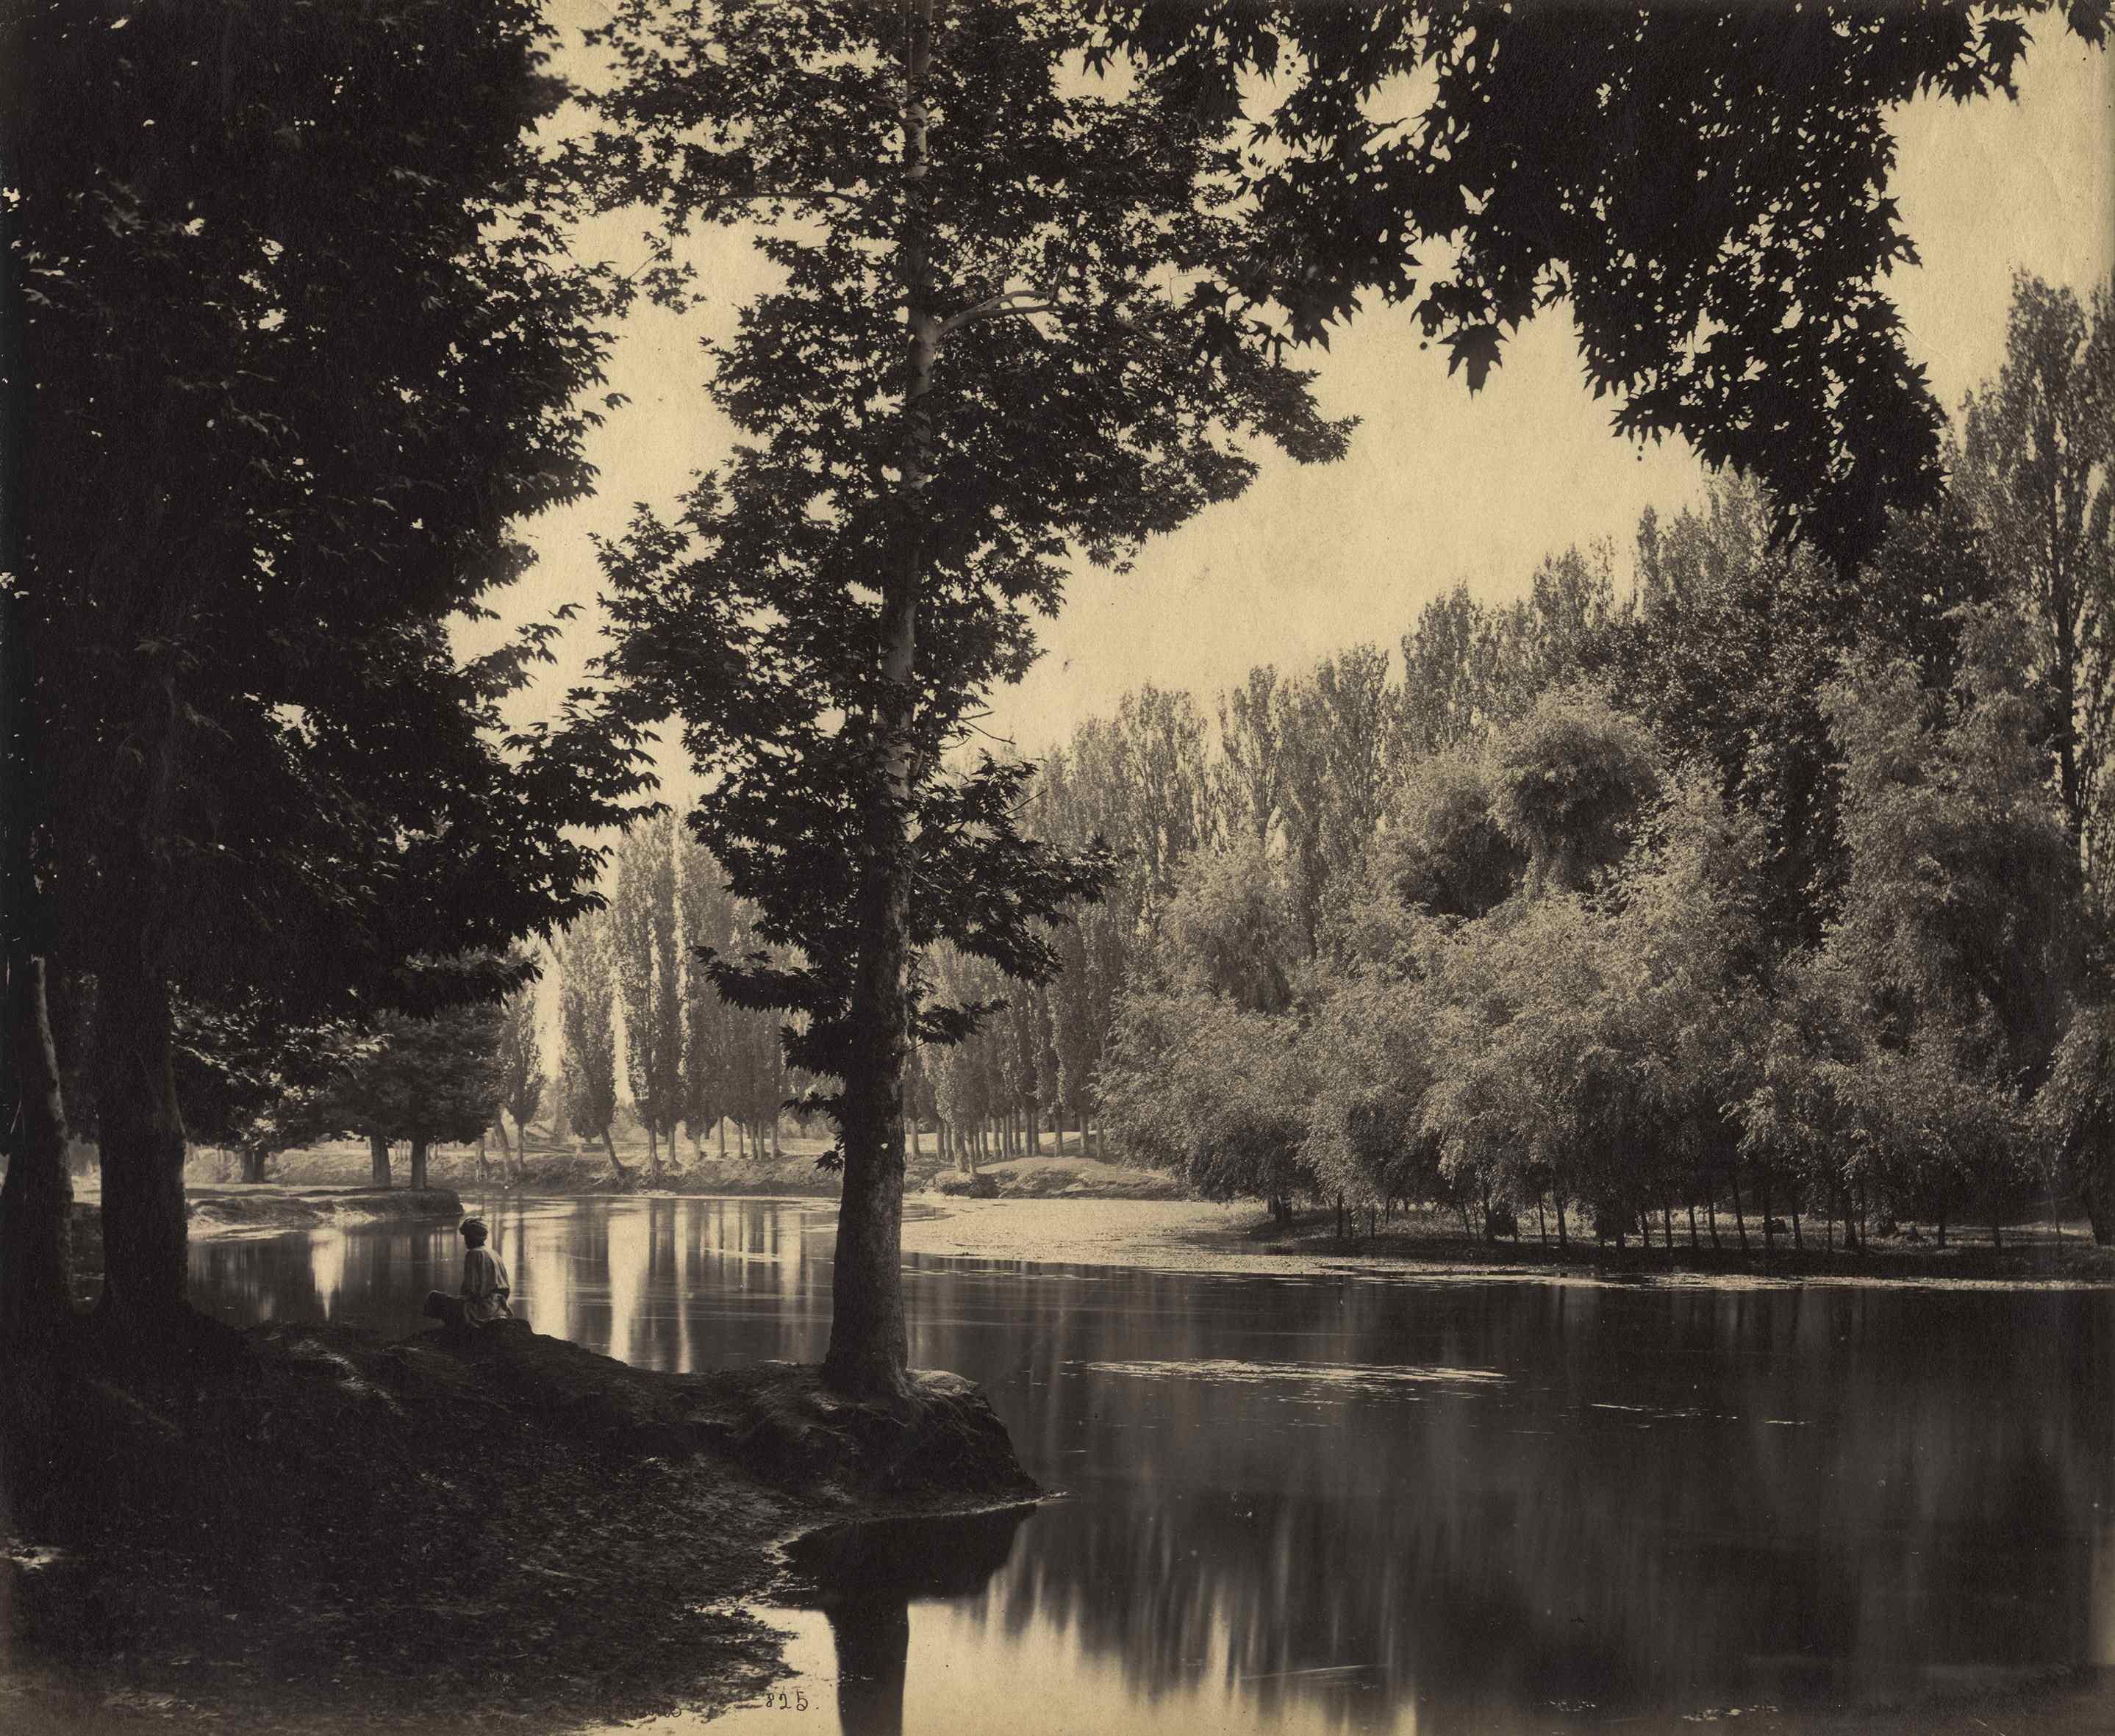 Samuel Bourne - 'View on the Dal Canal, Srinigar, Kashmir', India, c. 1865, Albumen print